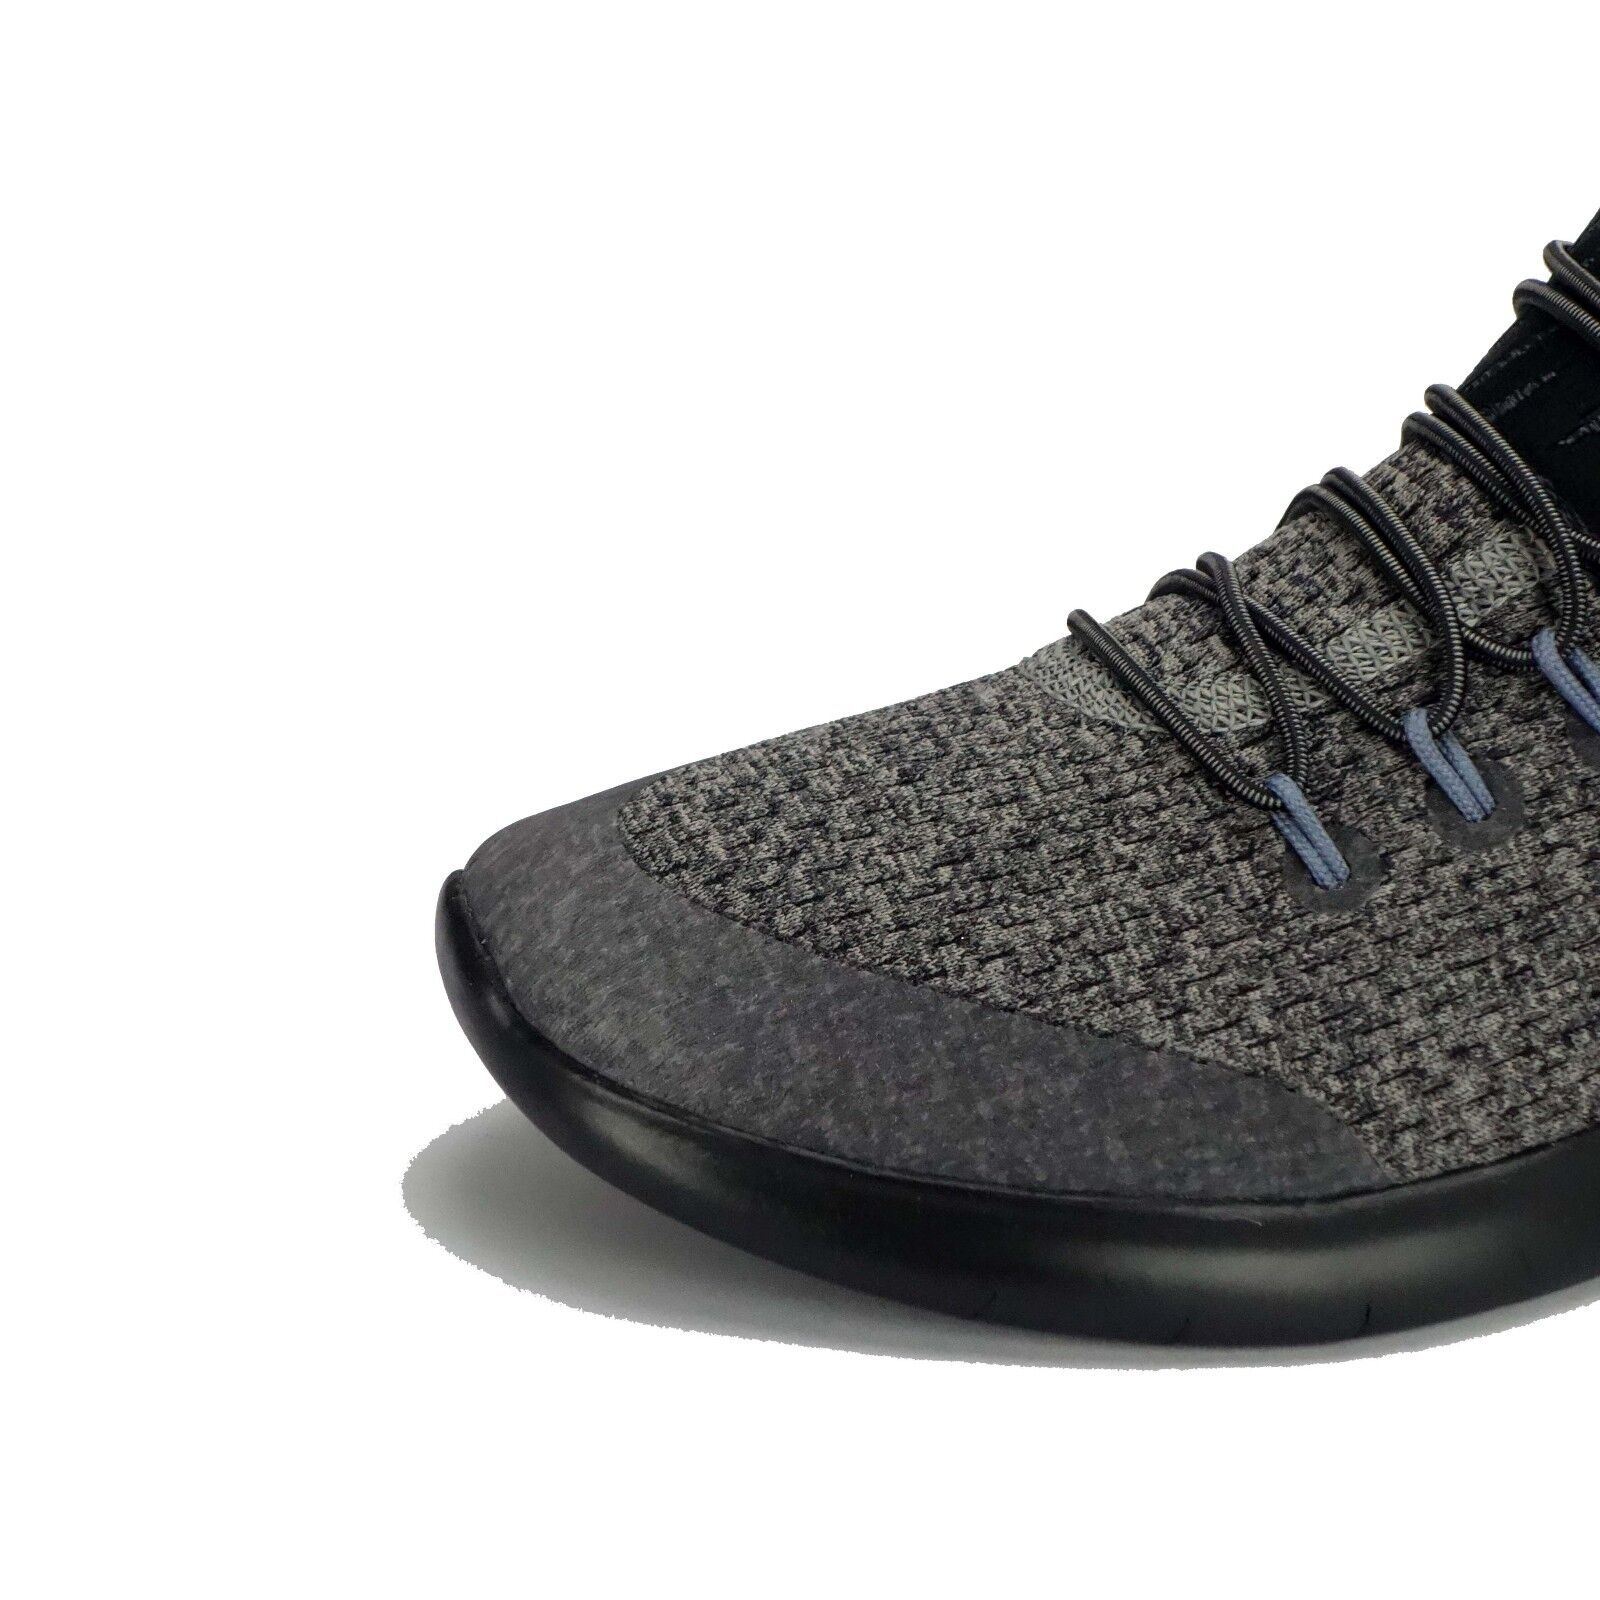 Nike Free rn Commuter zapatos 2018 Premium Para Mujer zapatos Commuter  Deportivos Ligero Negro 384c4b